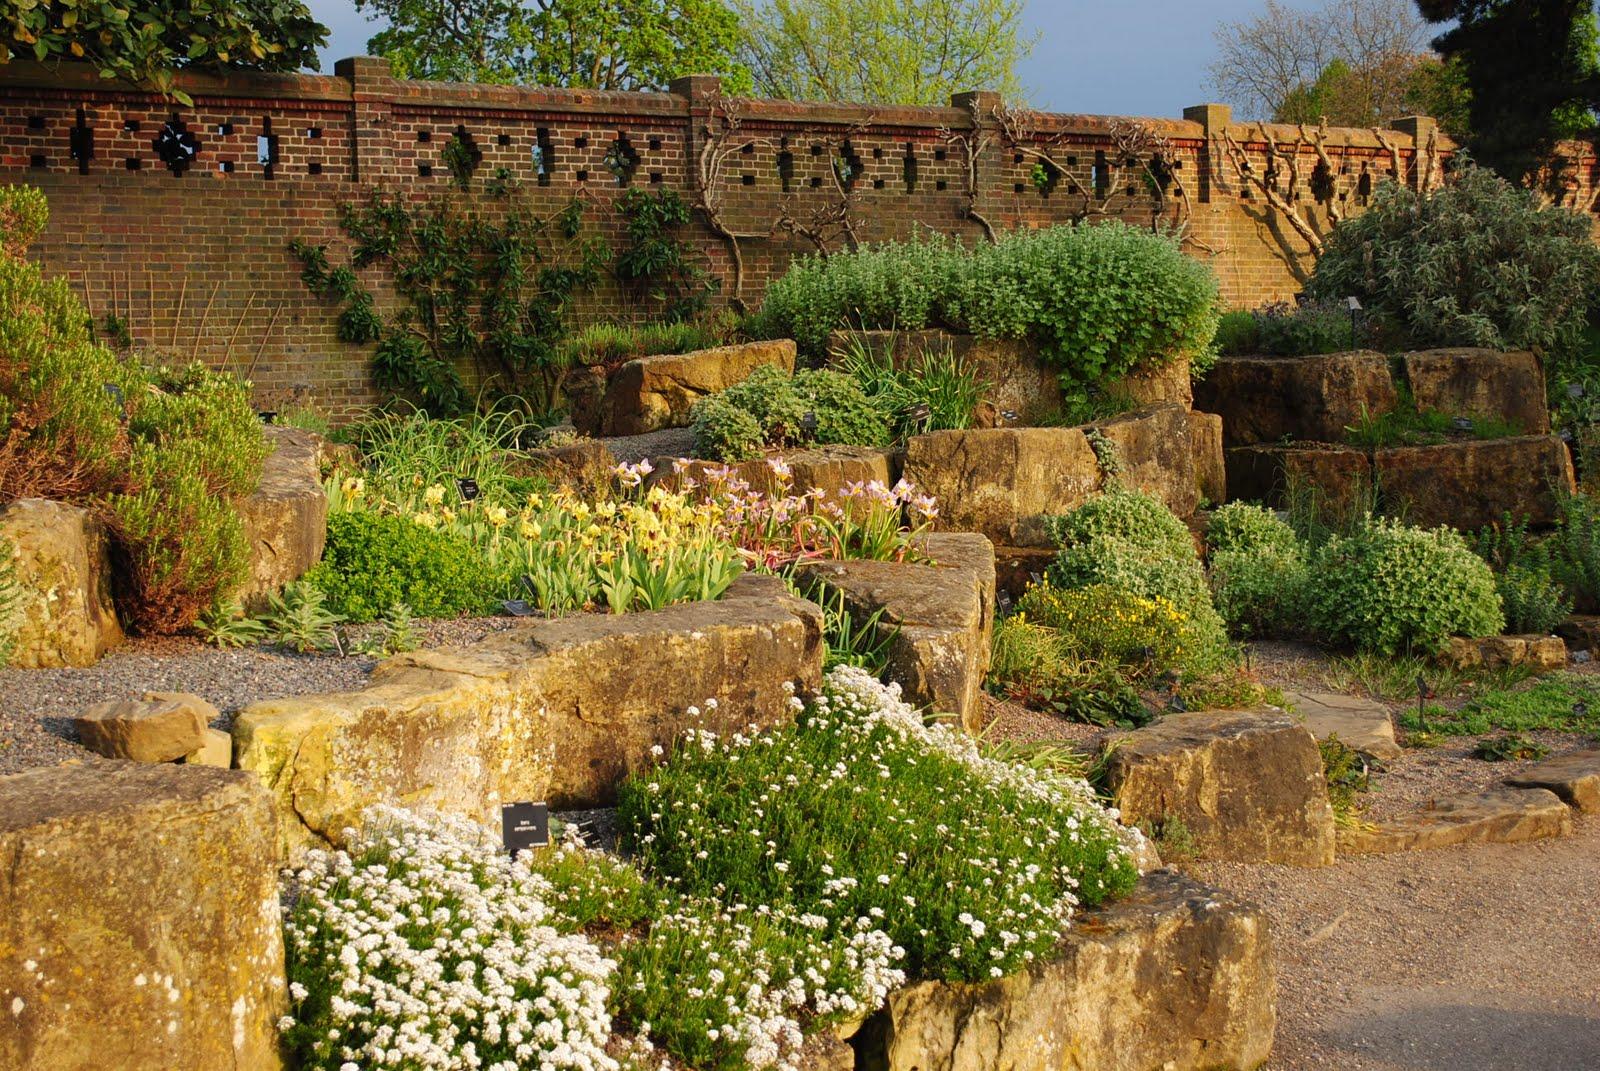 plantspeople: kew gardens - the mecca.